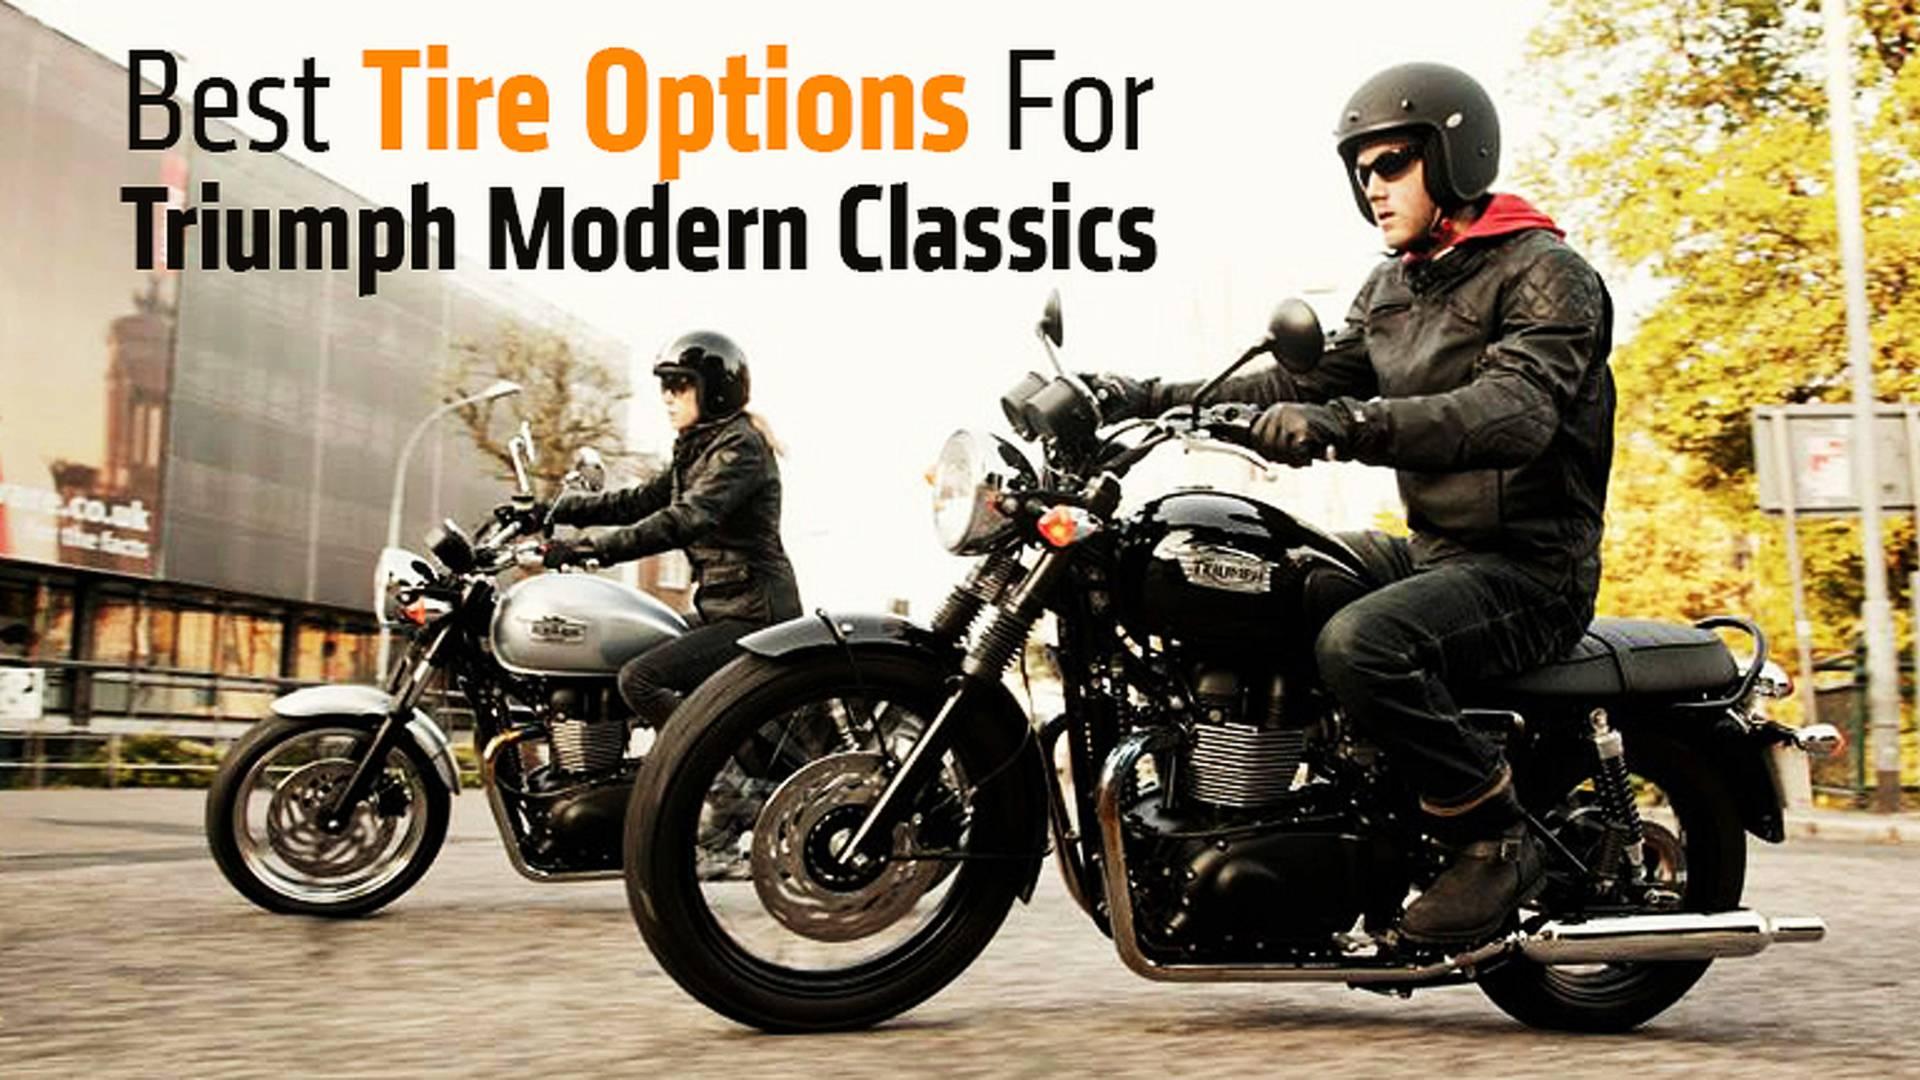 Best Tire Options For Triumph Modern Classics